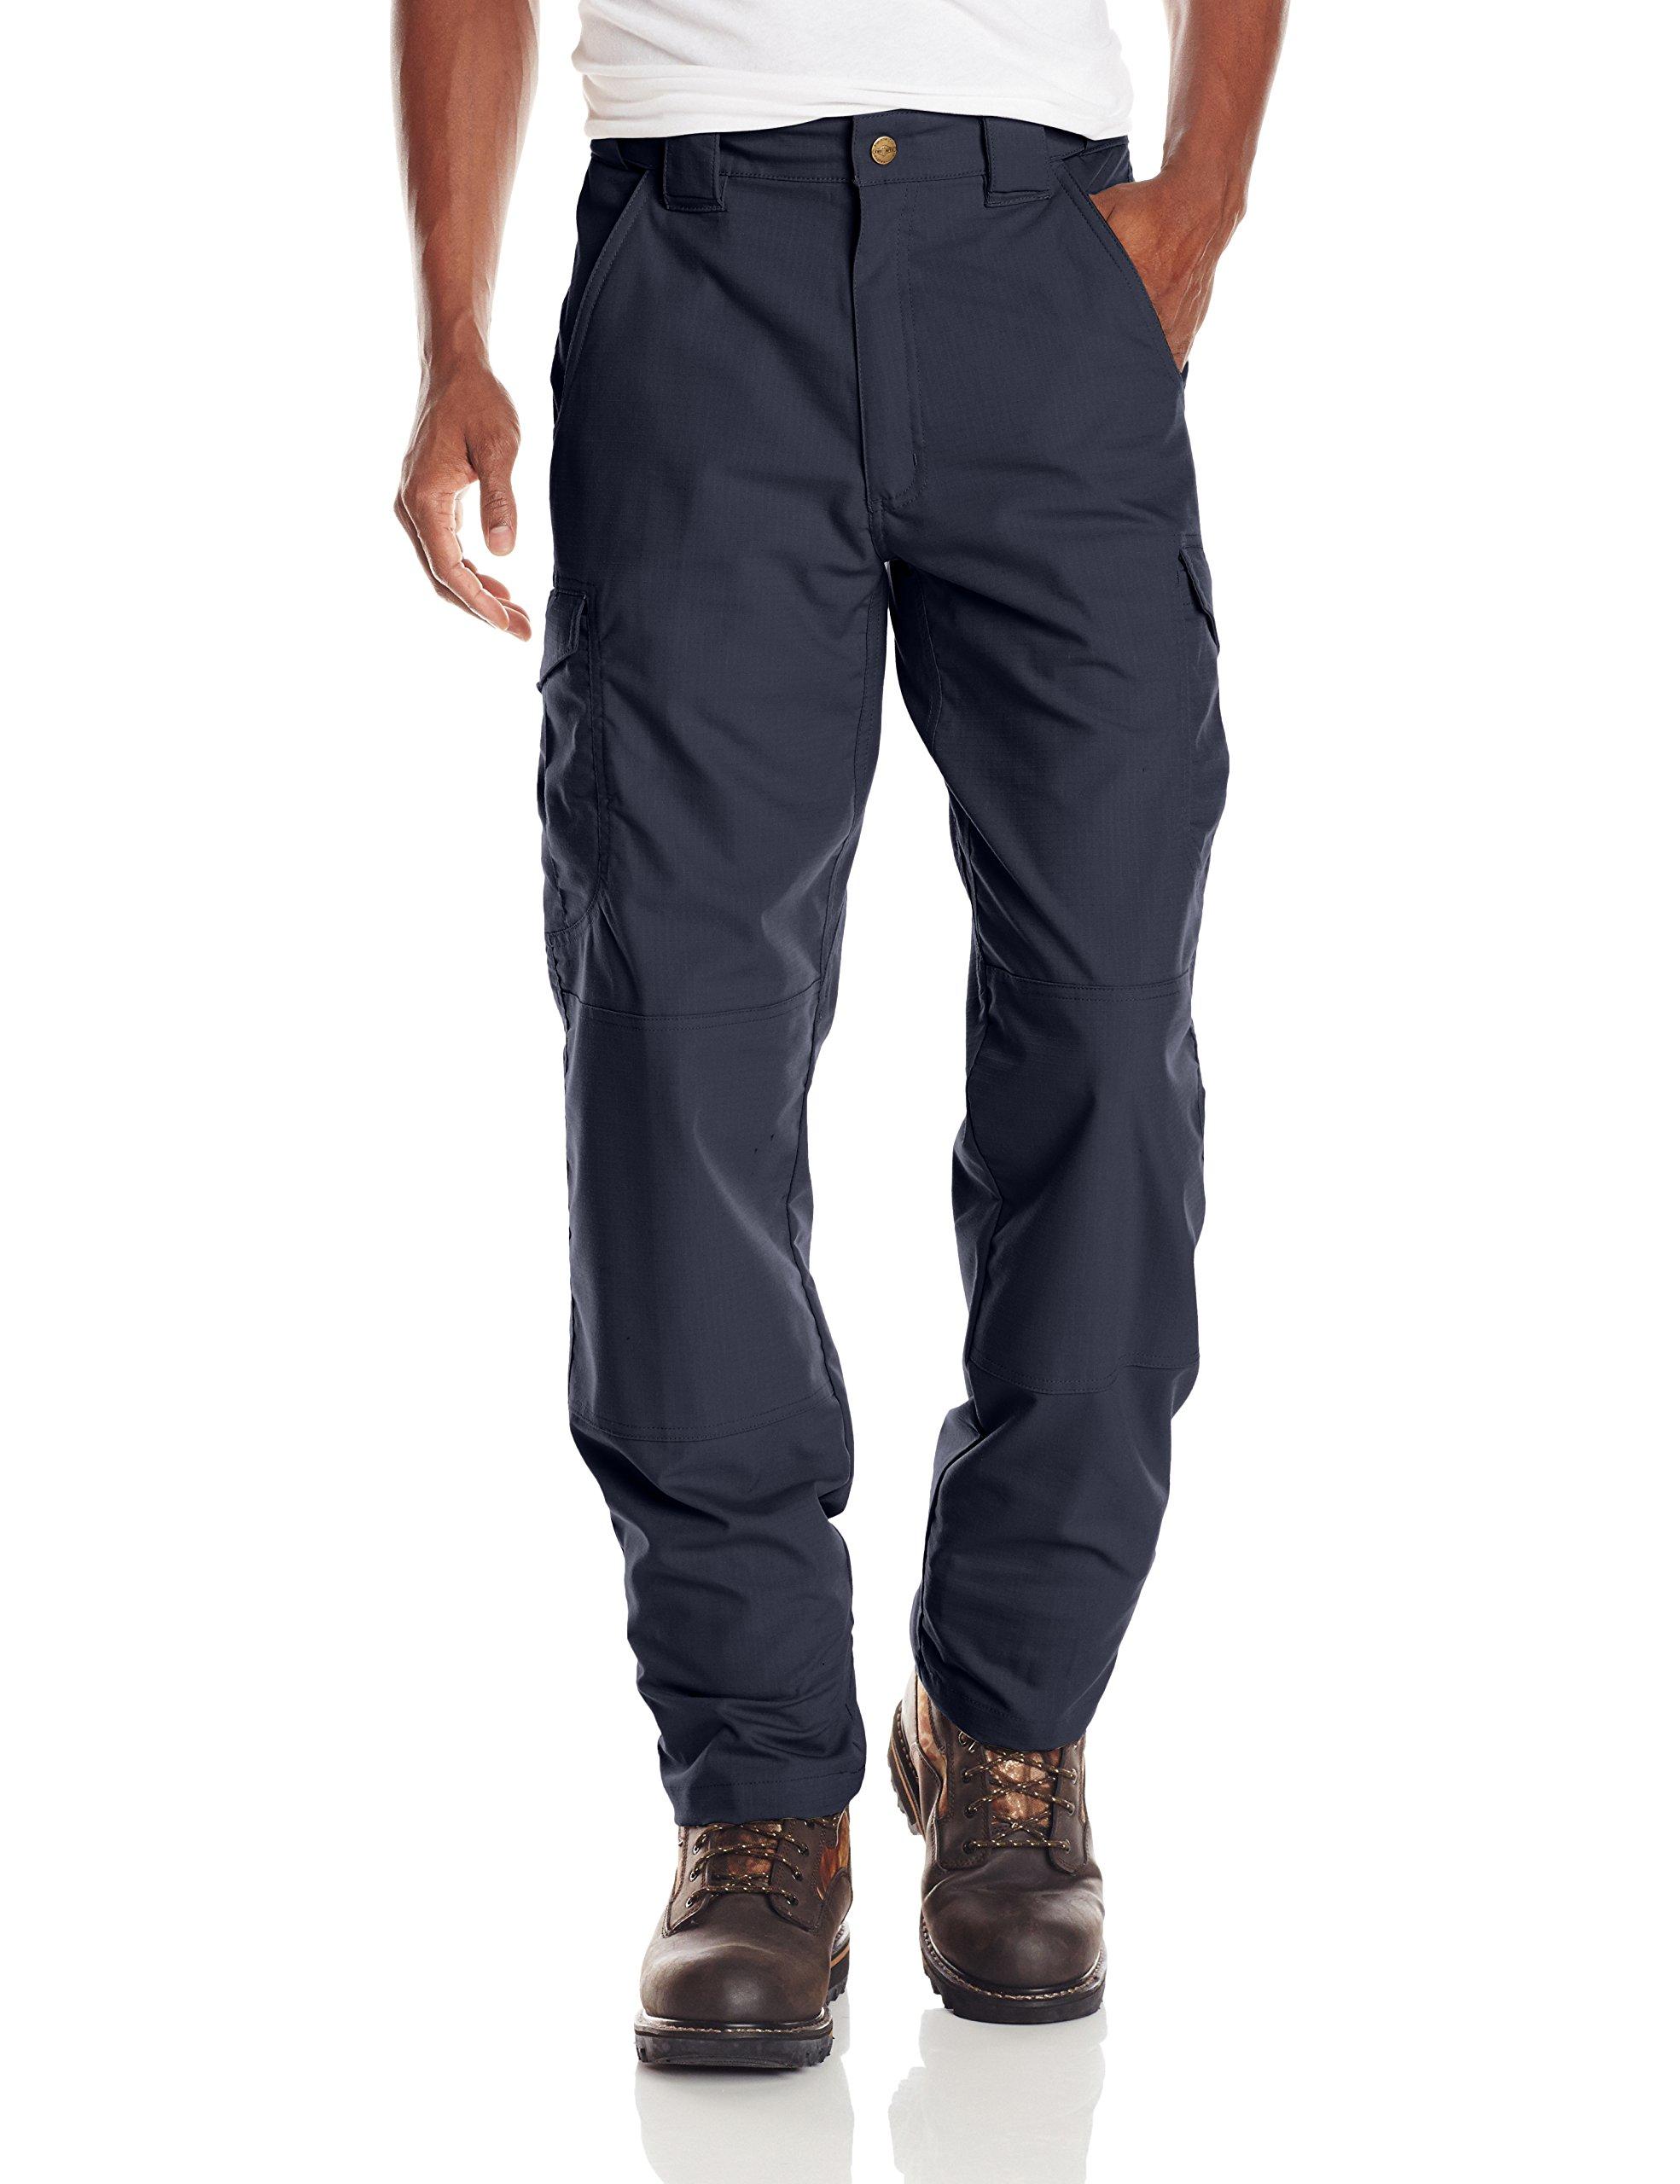 Tru-Spec Men's 24-7 Ascent Pant, Navy, (Waist:28 Length:30)